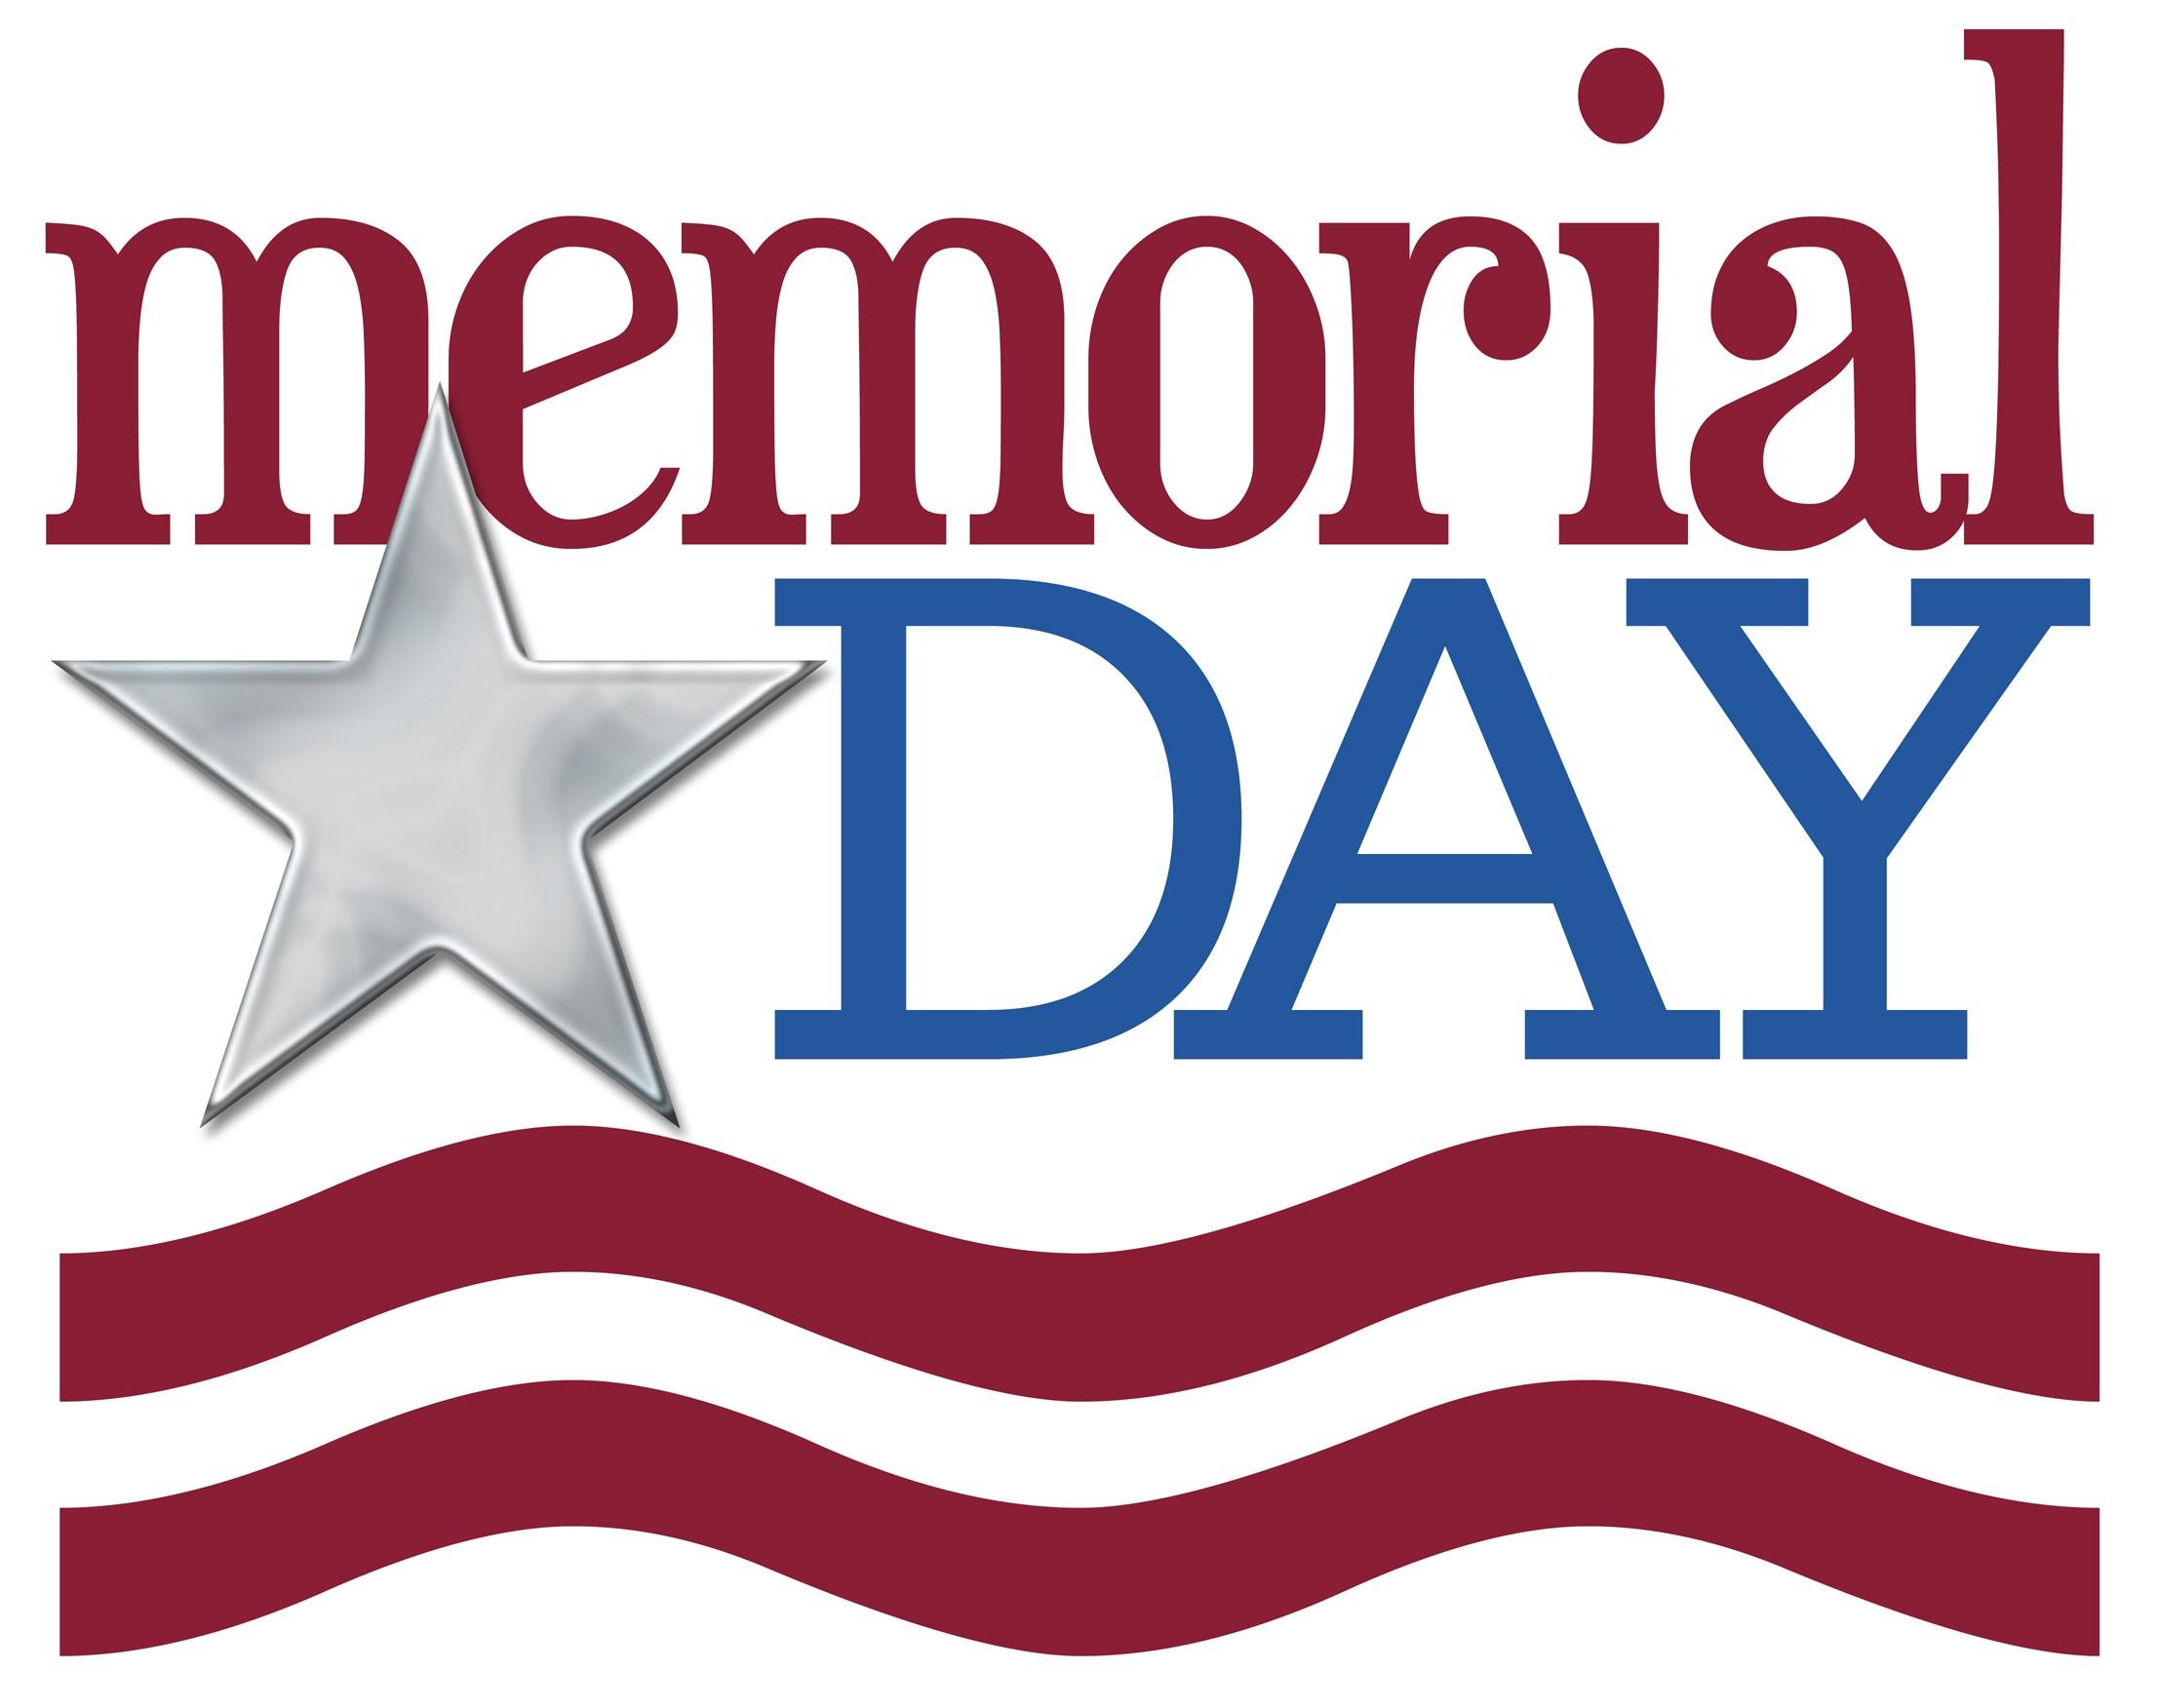 The kirksey team happymemorialdayclipartmaymemorial. 2016 clipart memorial day